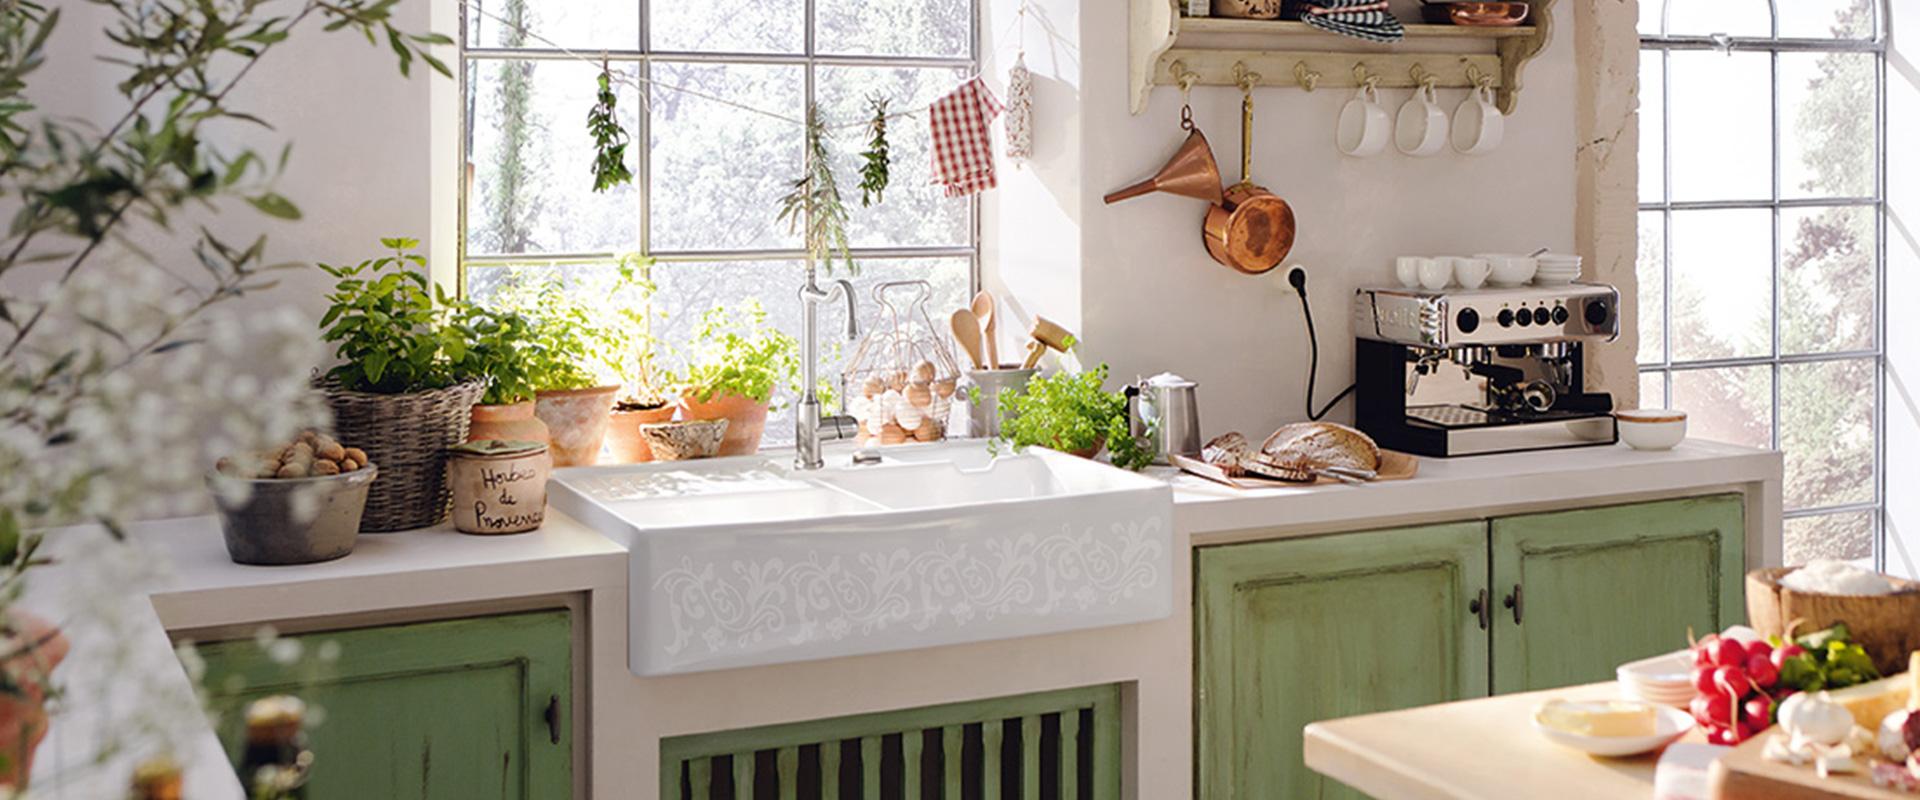 1334737842-02084600 Villeroy Boch Sinks Kitchen